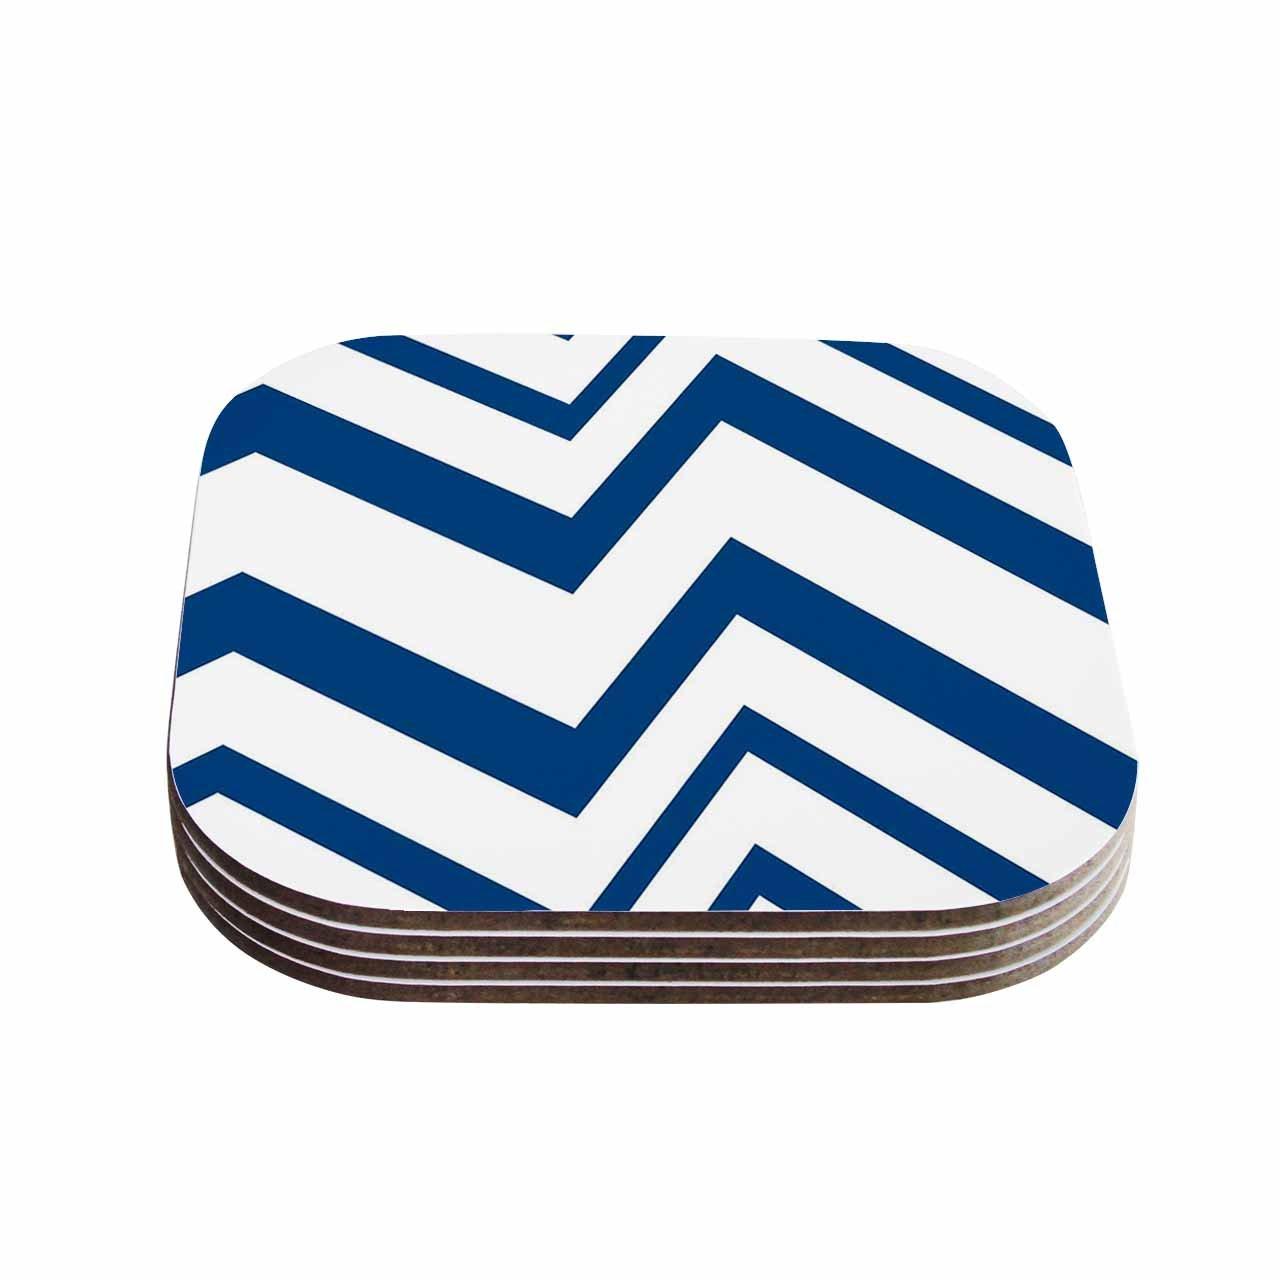 Set of 4 Multicolor KESS InHouse NL DesignsZigZag Navy Blue White Coasters 4 x 4